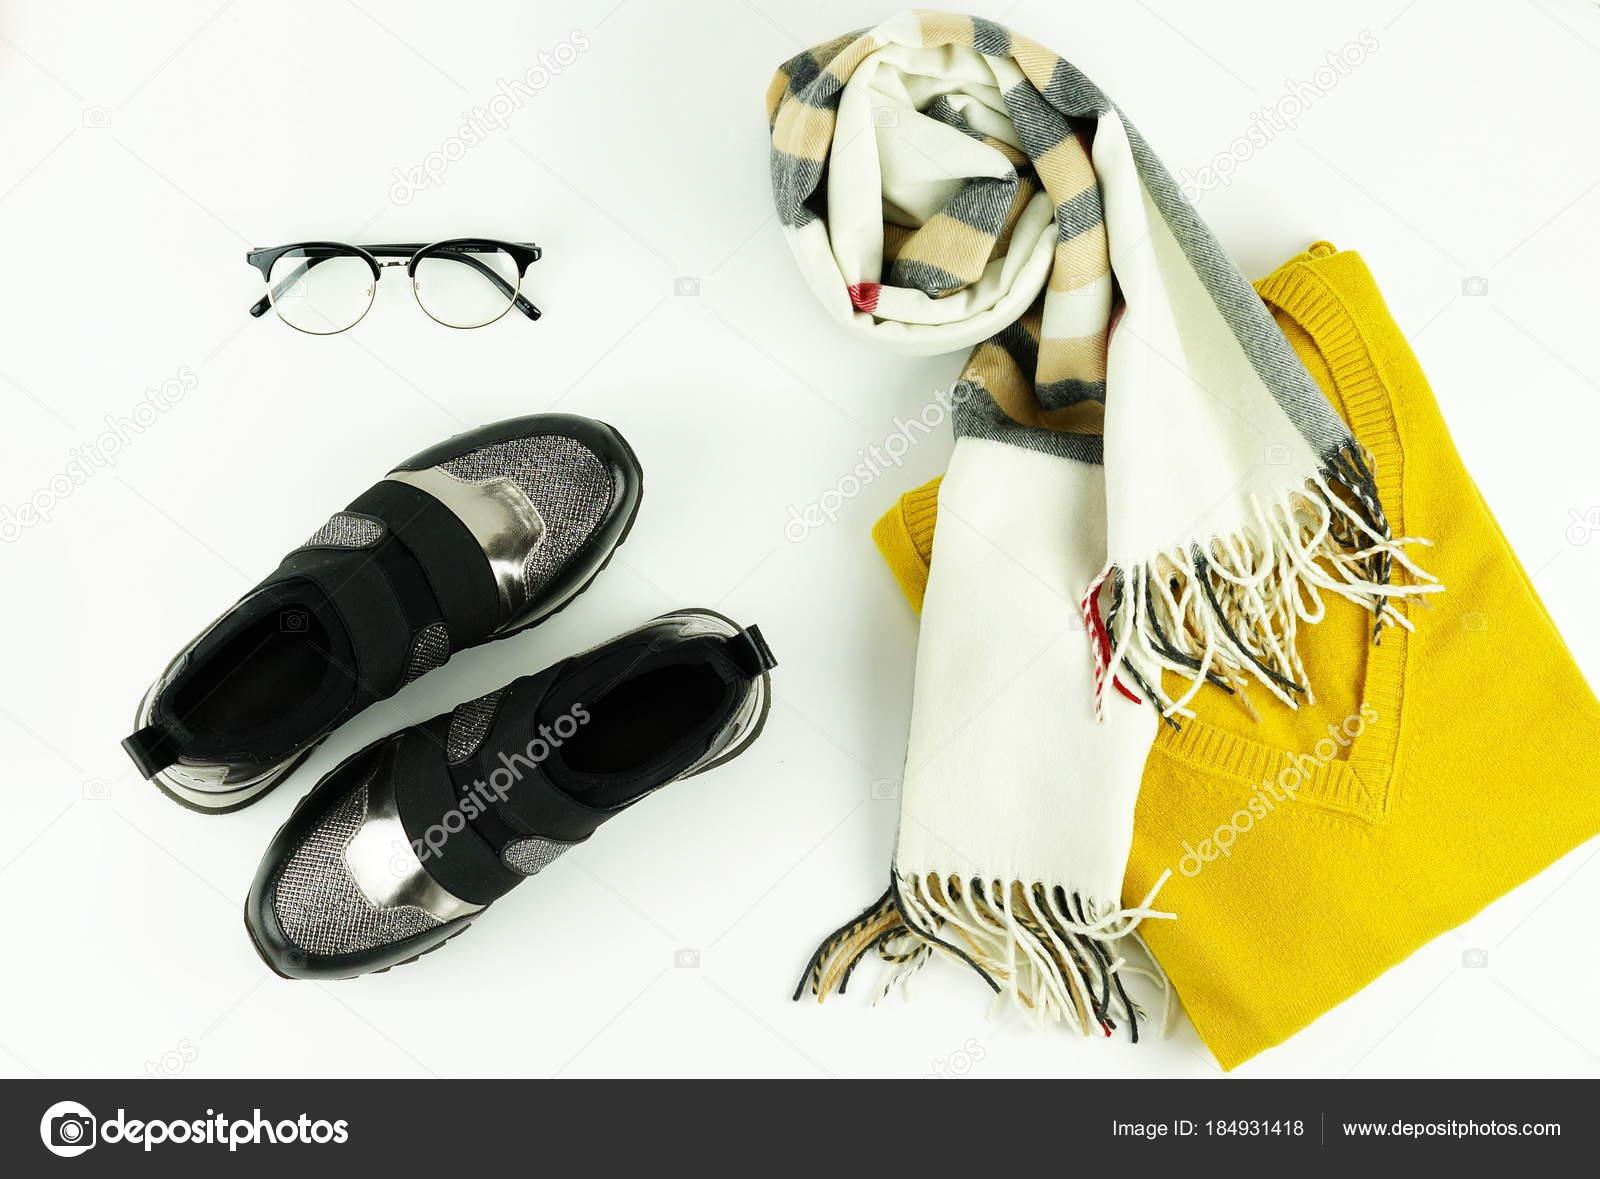 Kleding Schoenen.Modieuze Kleding Schoenen Accessoires Cashmere Gele Trui Sjaal